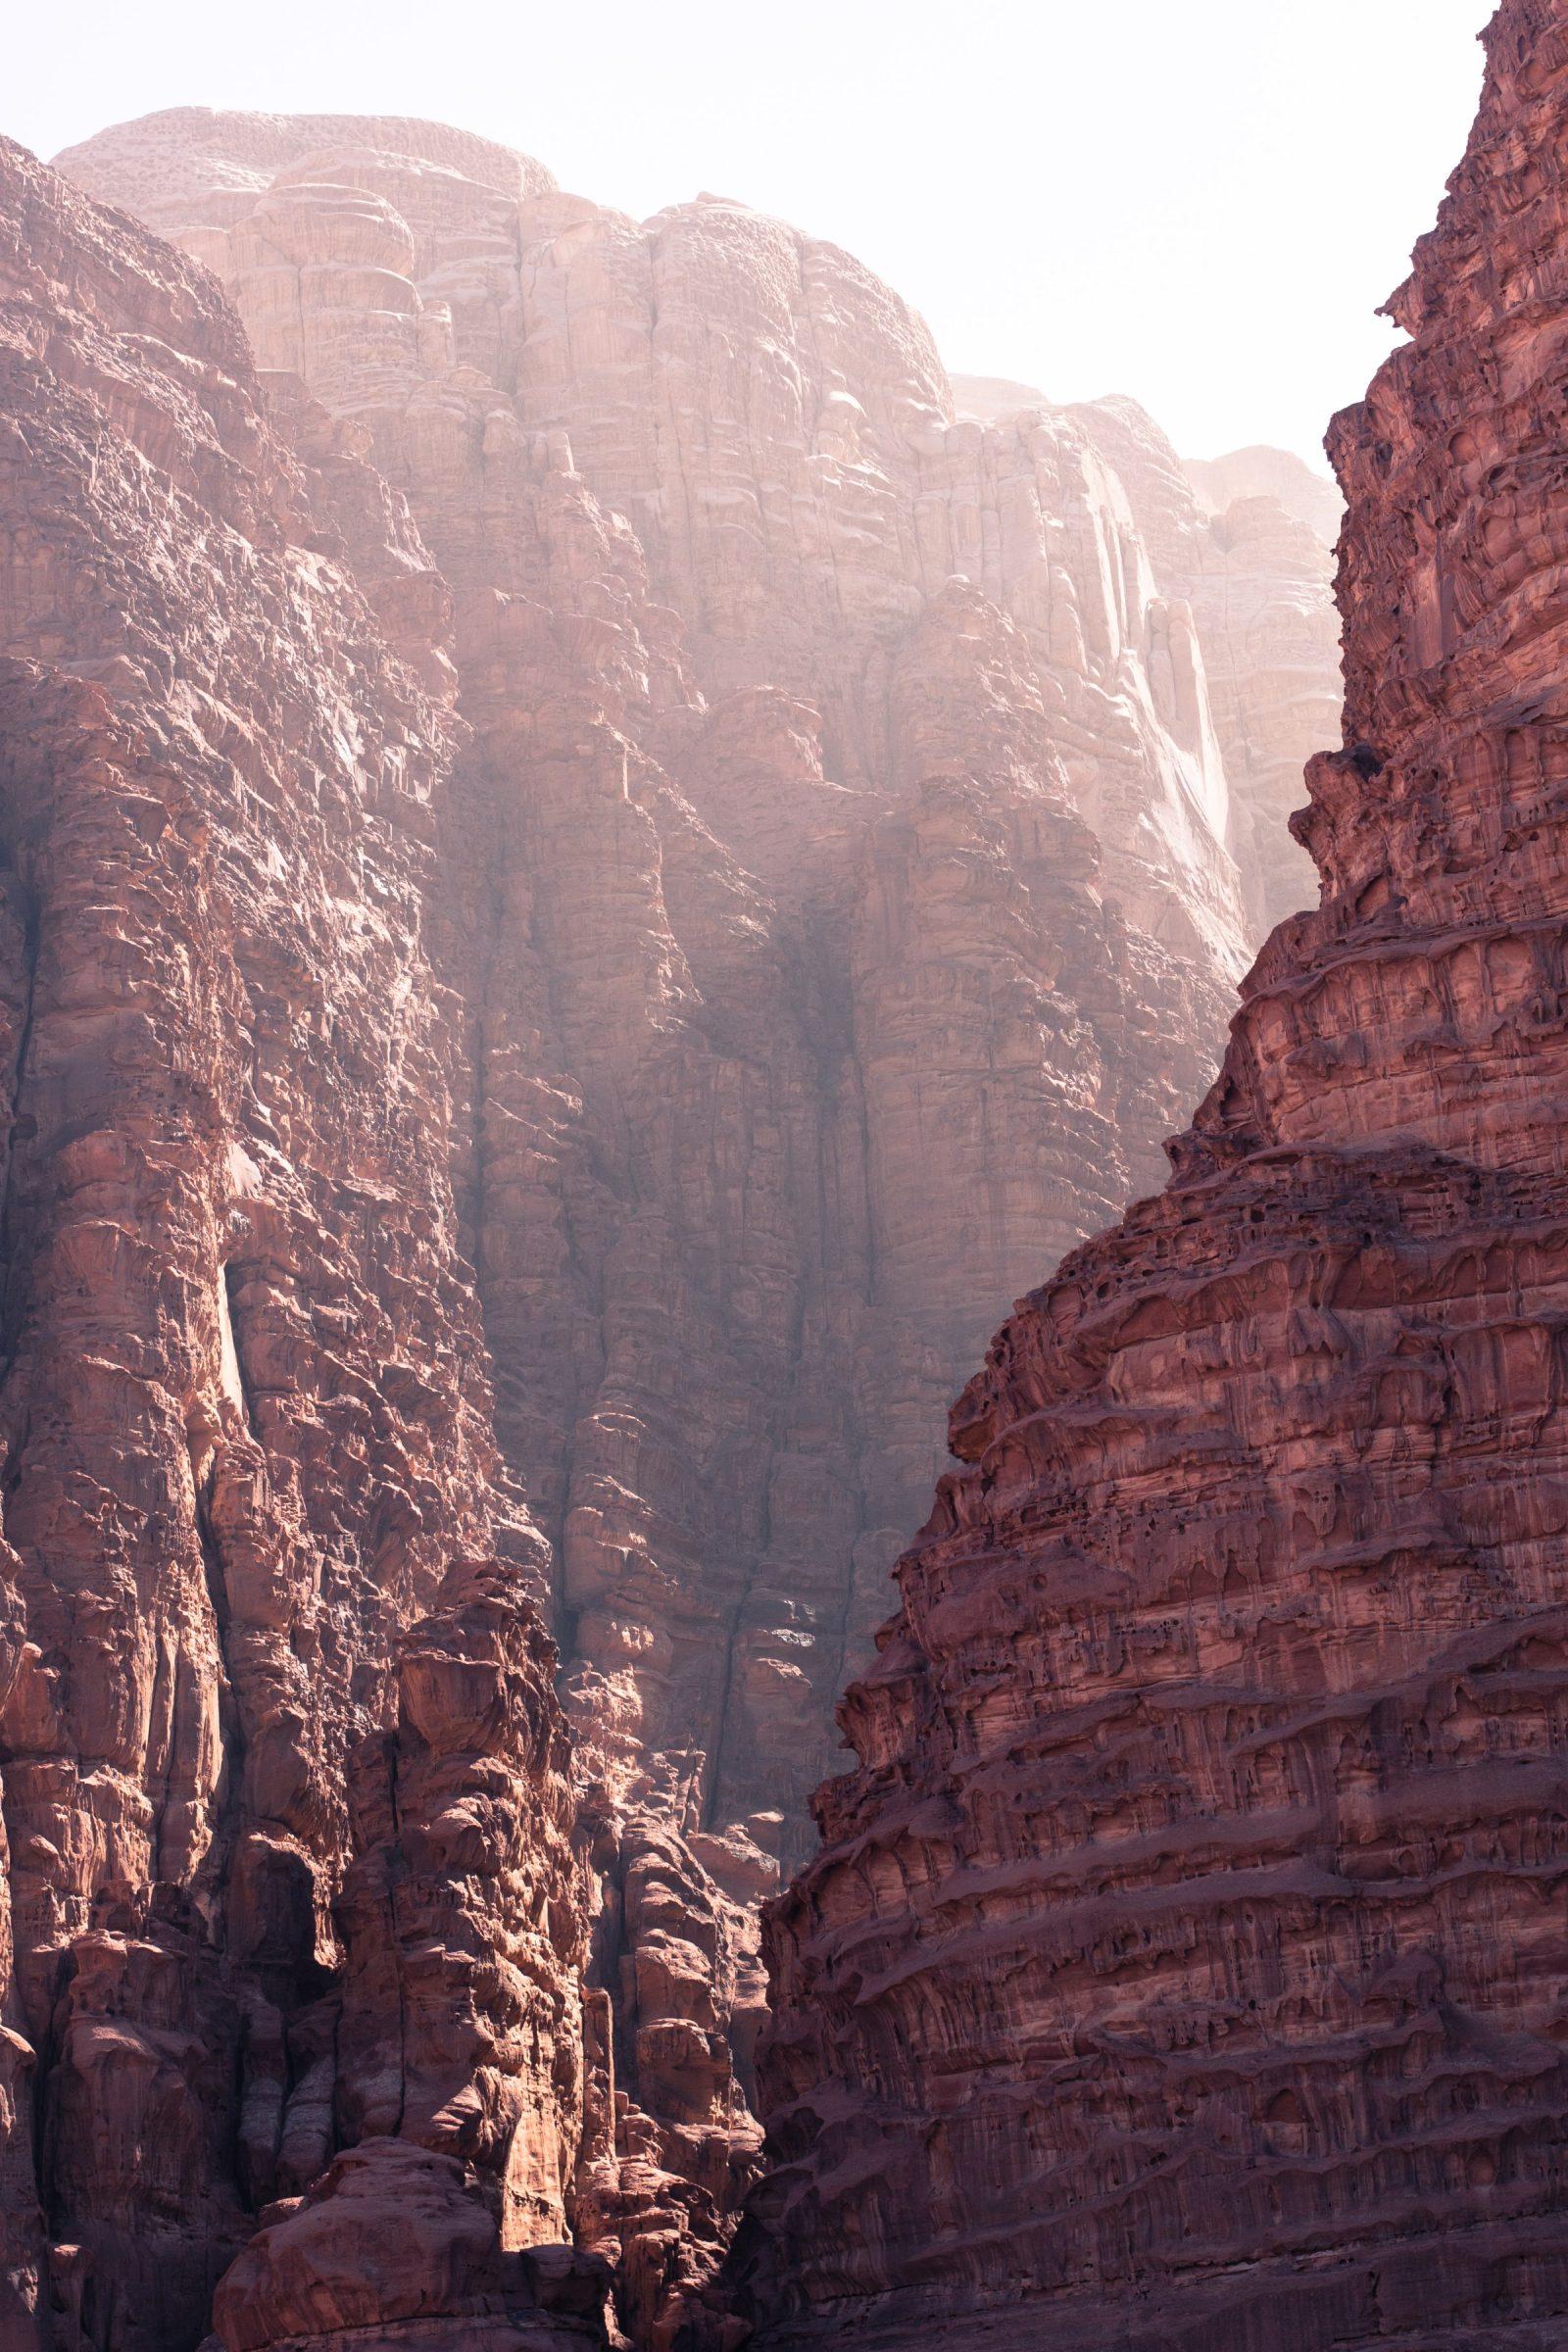 Wadi Rum in Jordanië is één grote filmset